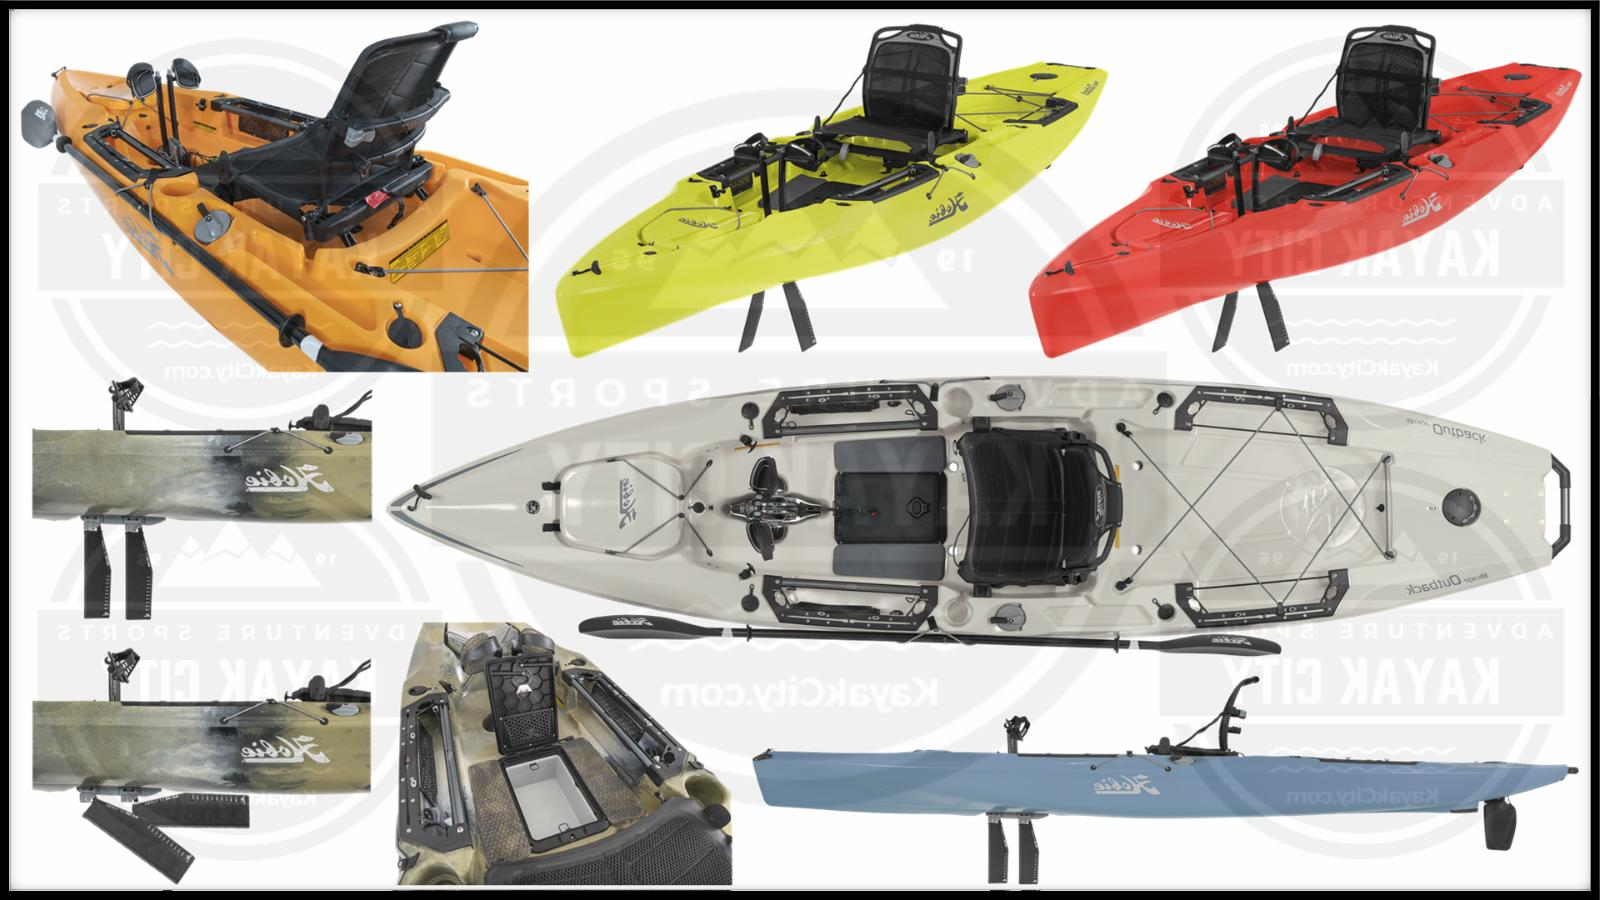 2019 mirage outback pedal fishing kayak multiple